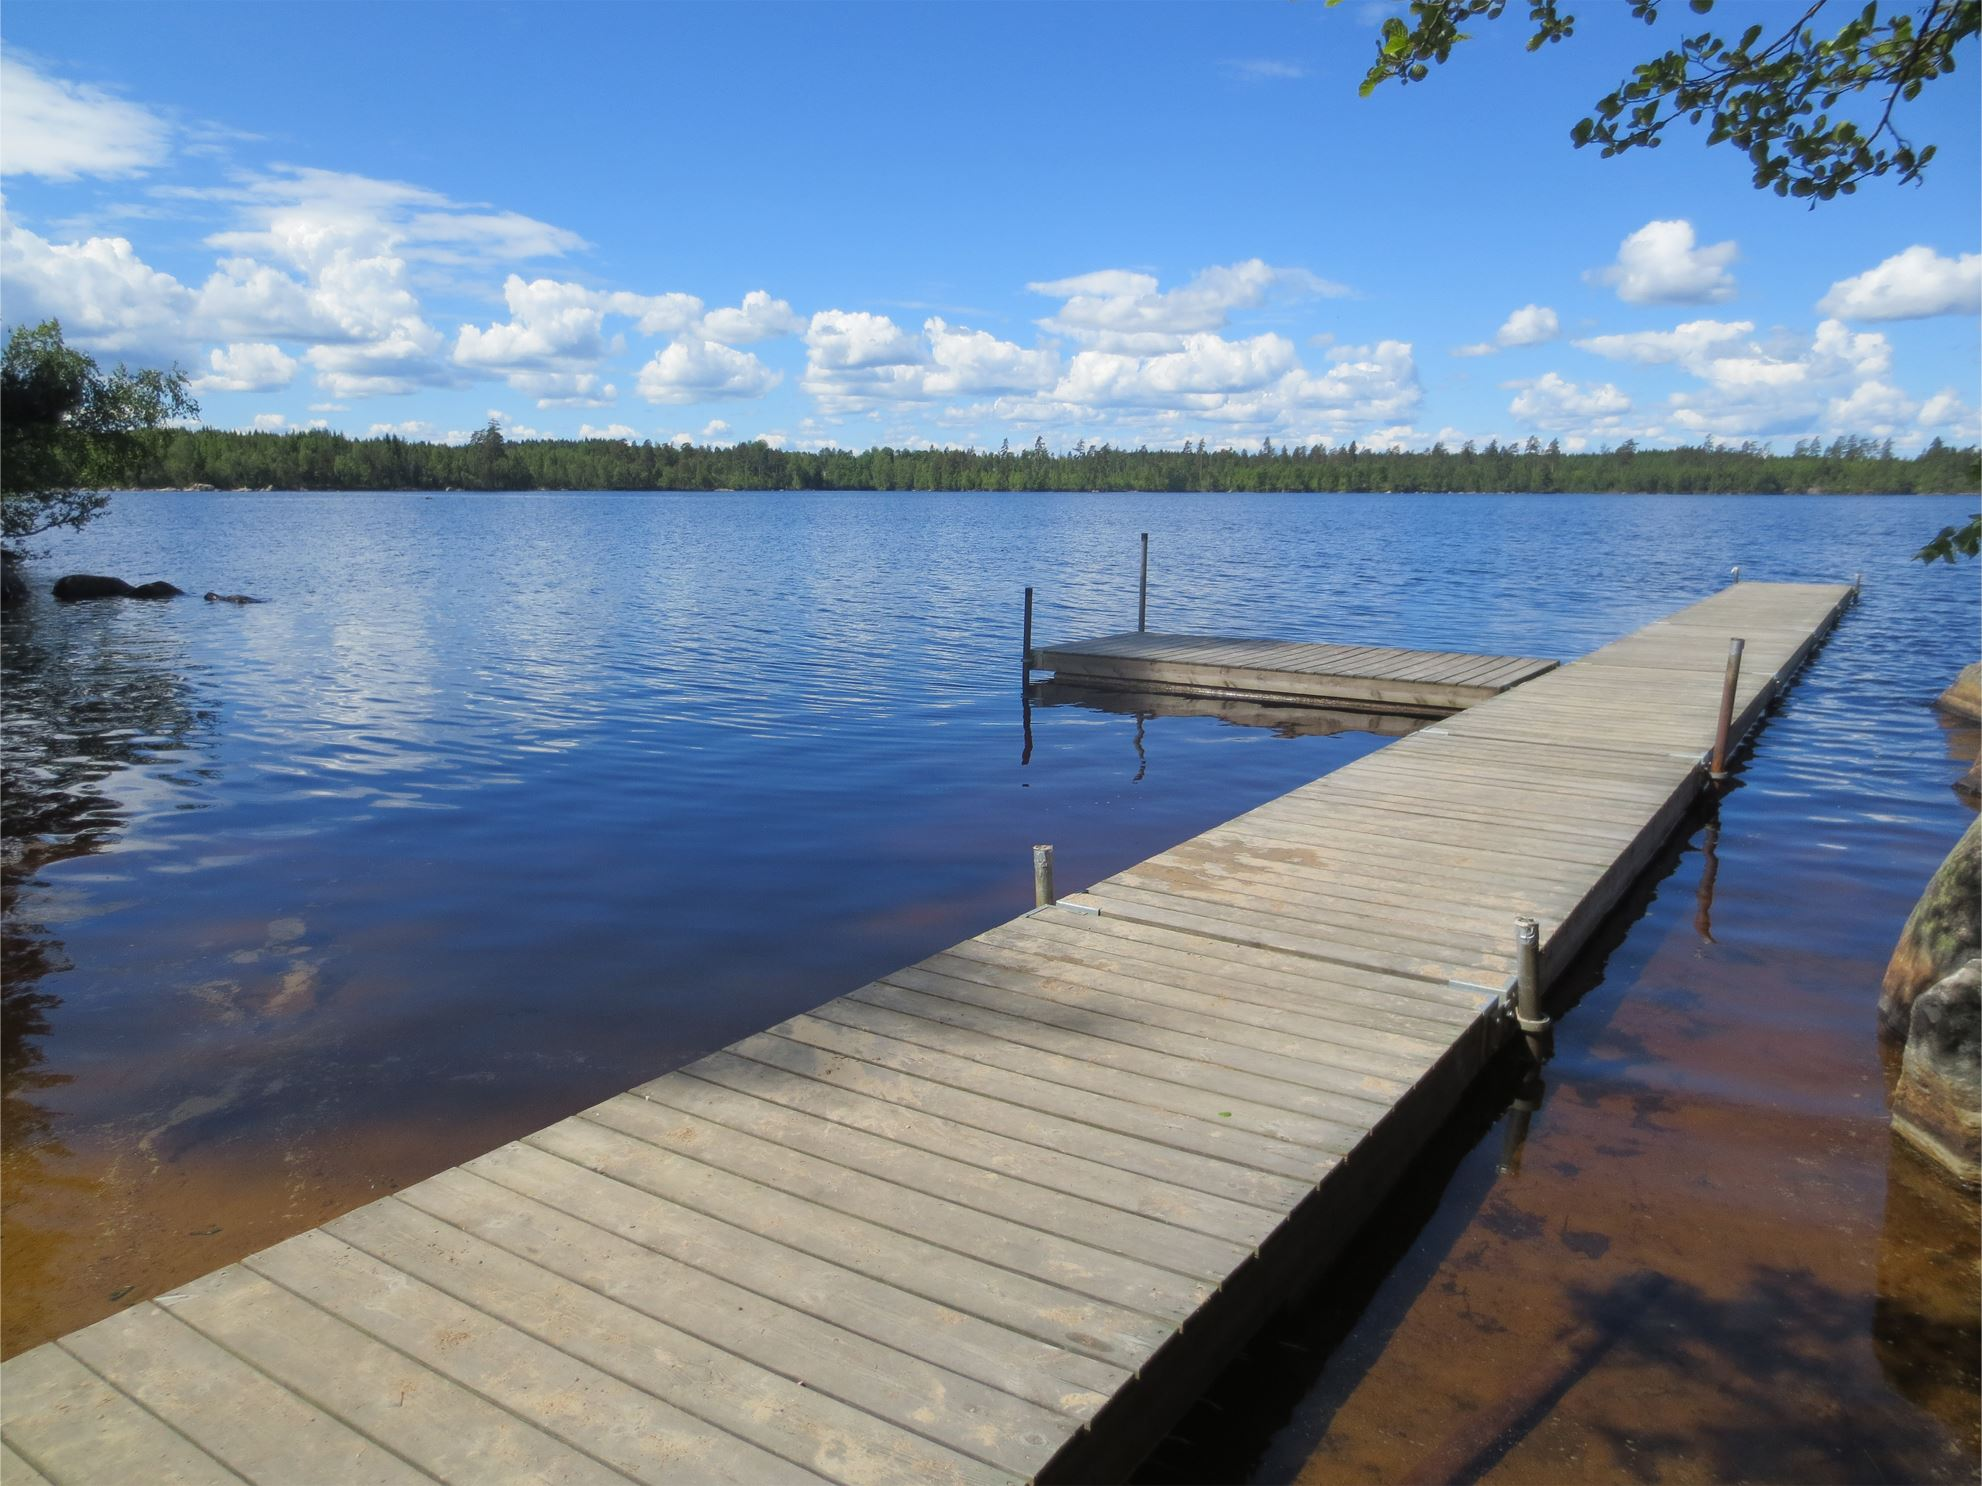 Bathing place Festplatsen Madsjön